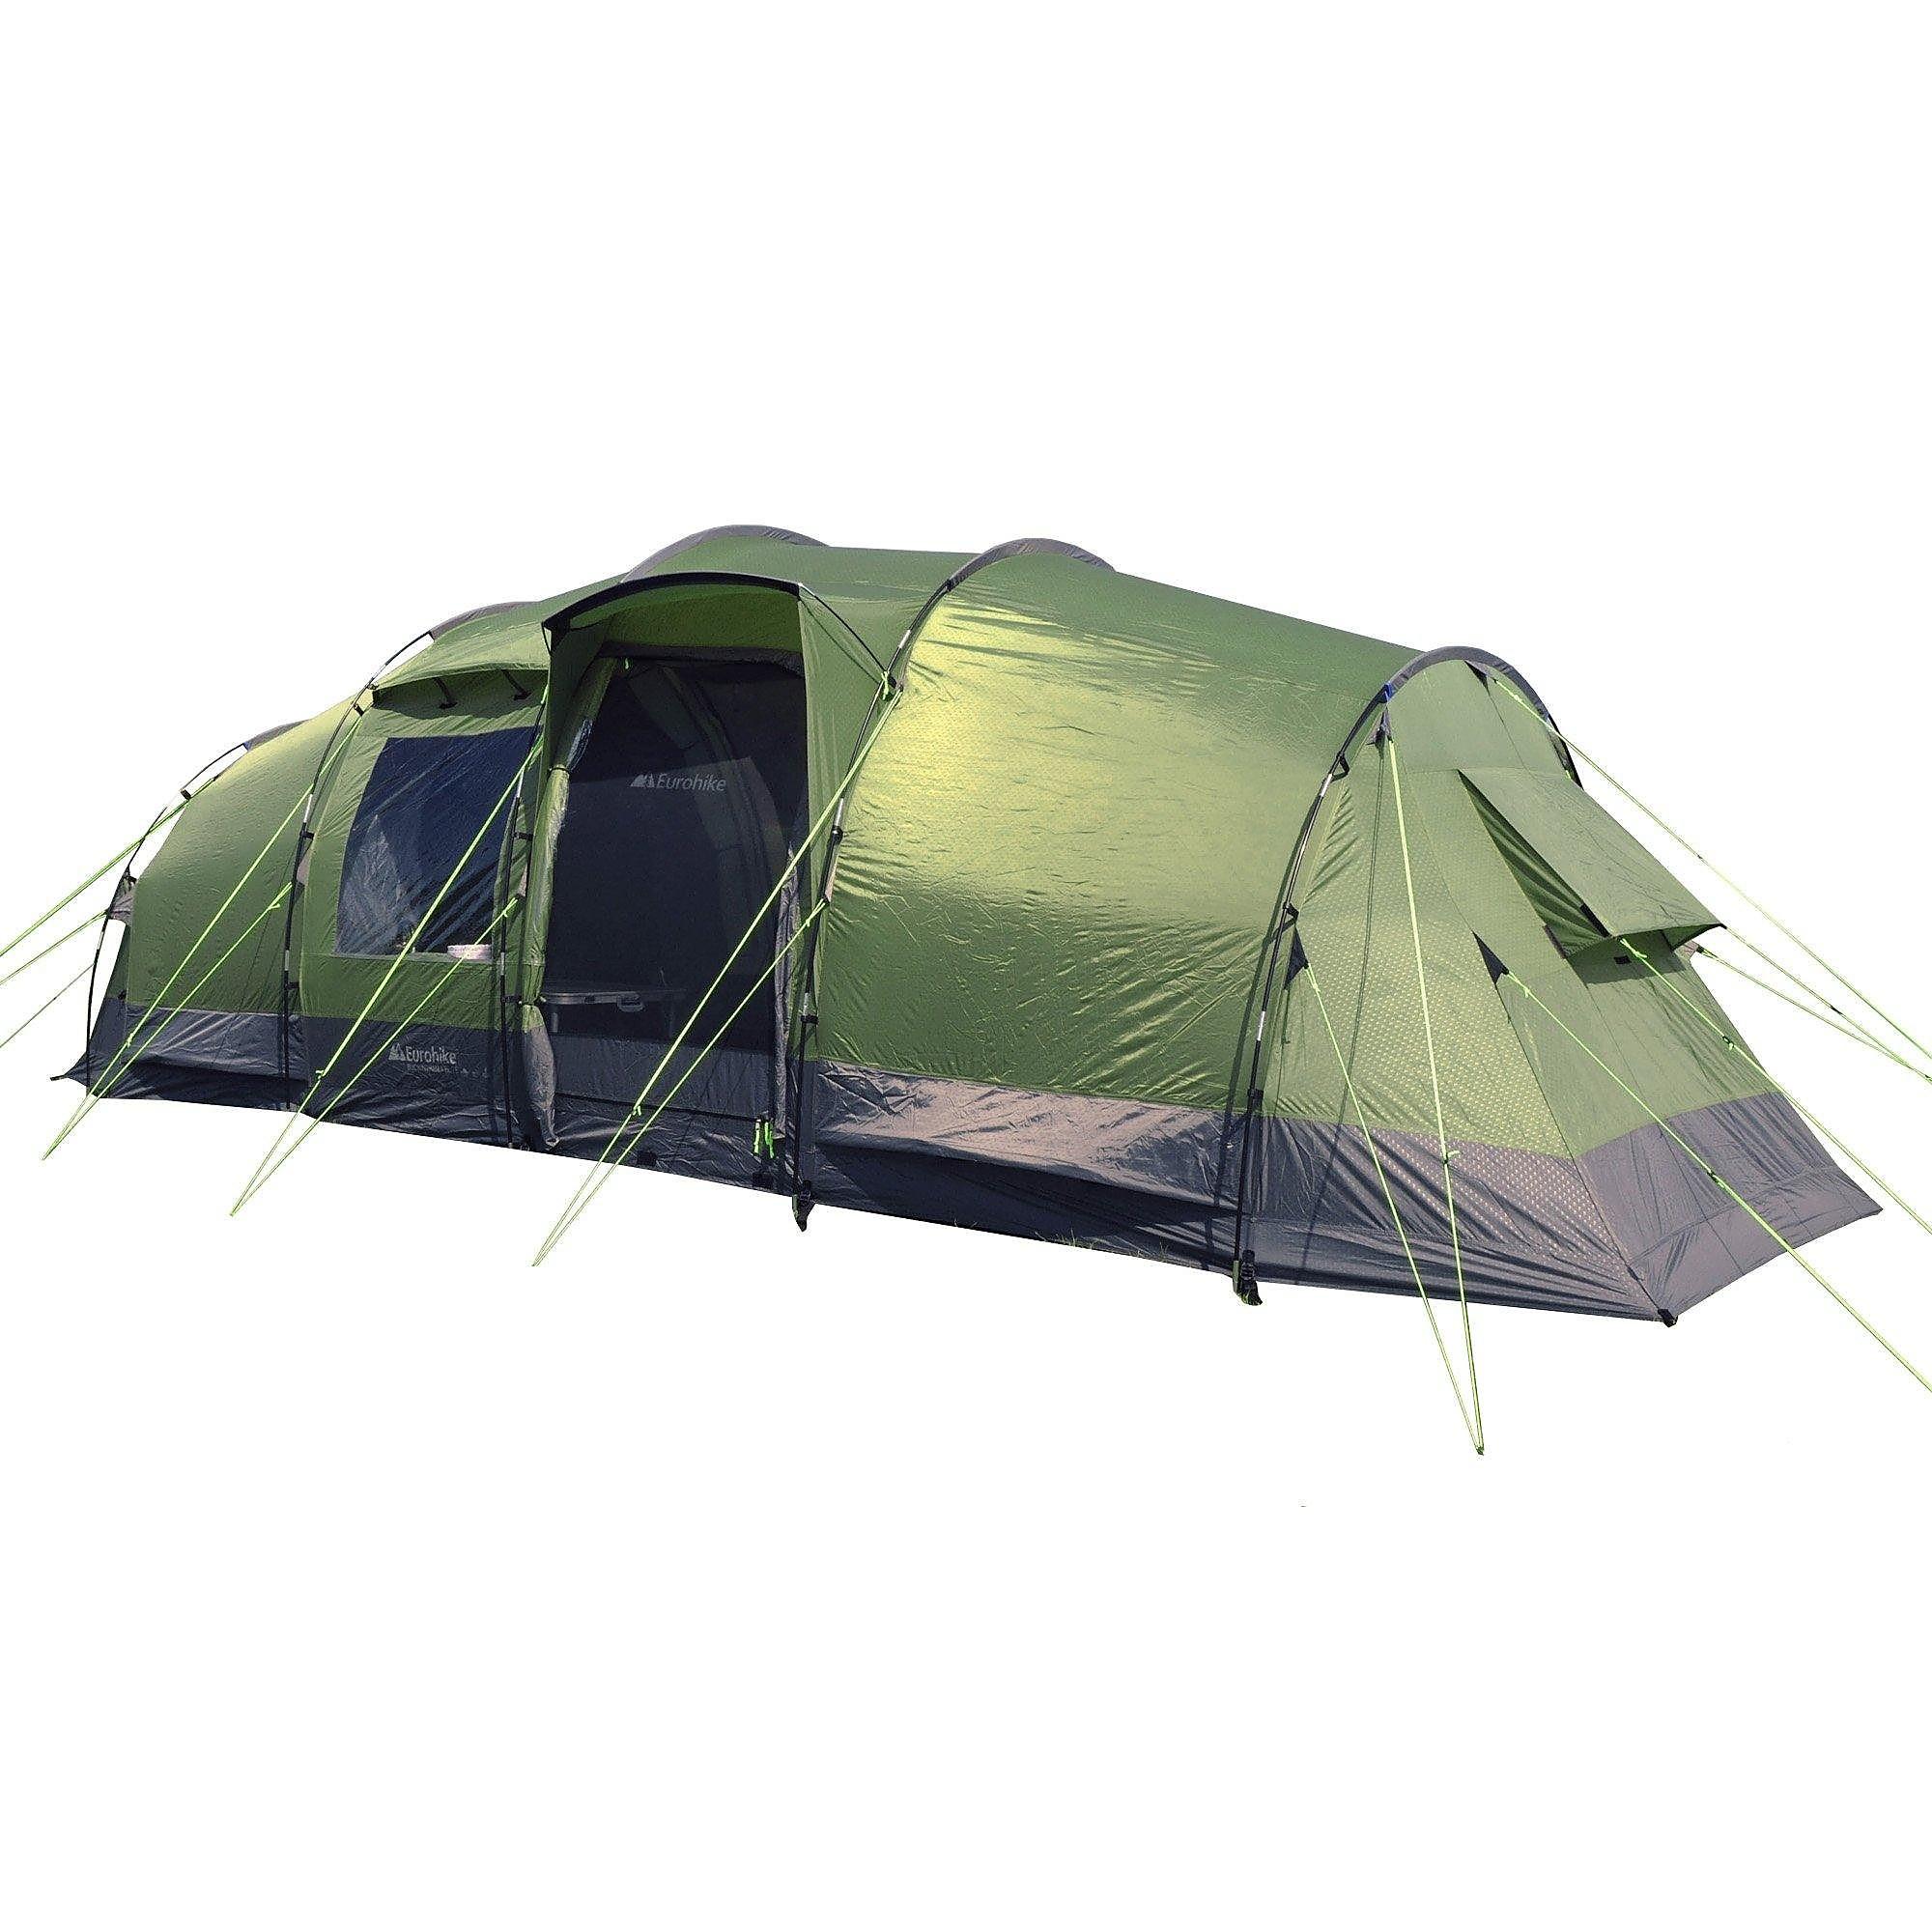 EUROHIKE Buckingham Elite 6 Man Tent